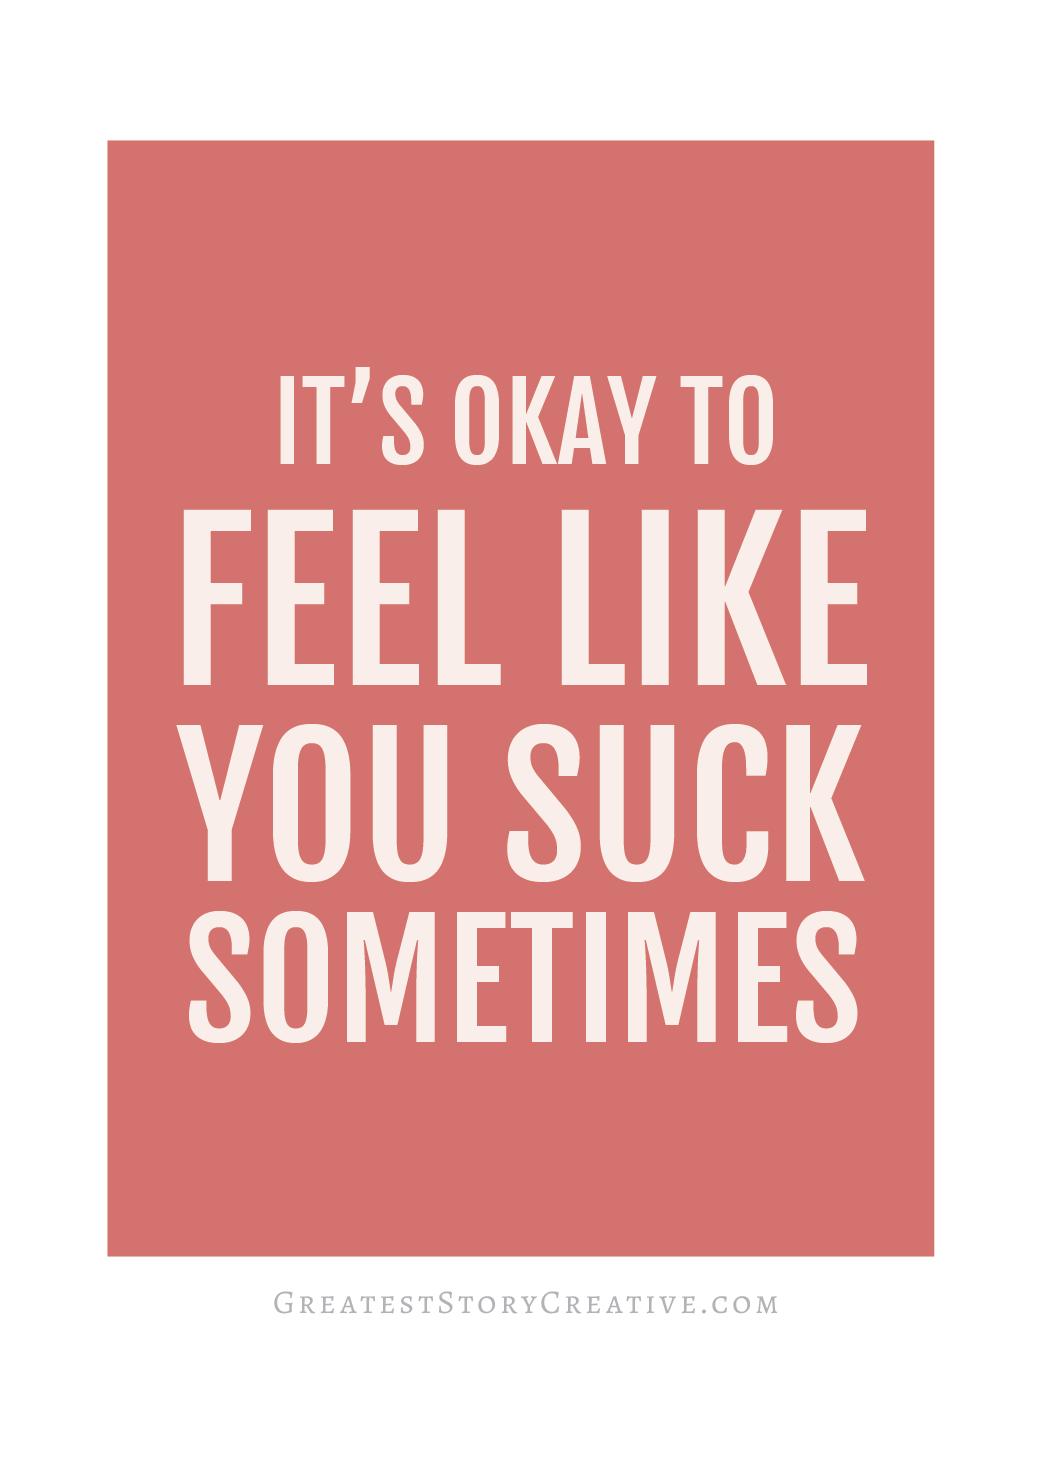 Hey Entrepreneur, It's OK to Feel Like a Failure Sometimes